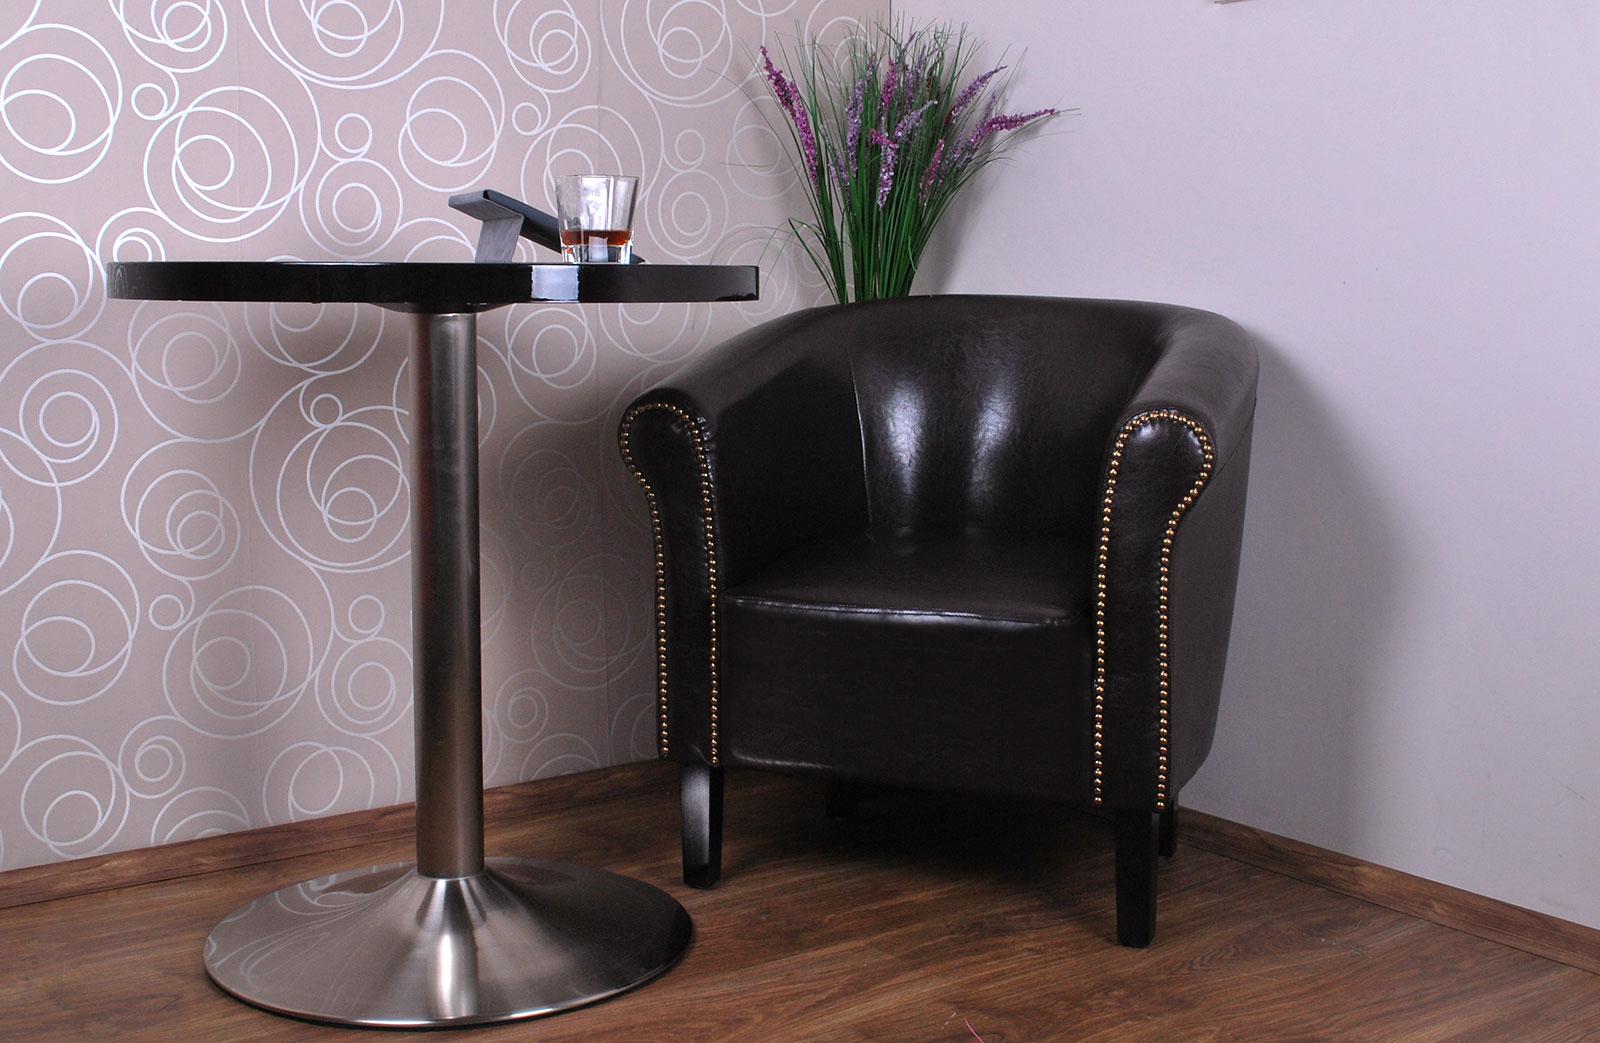 fauteuil crapaud monaco art d co salon fauteuil simili cuir ebay. Black Bedroom Furniture Sets. Home Design Ideas